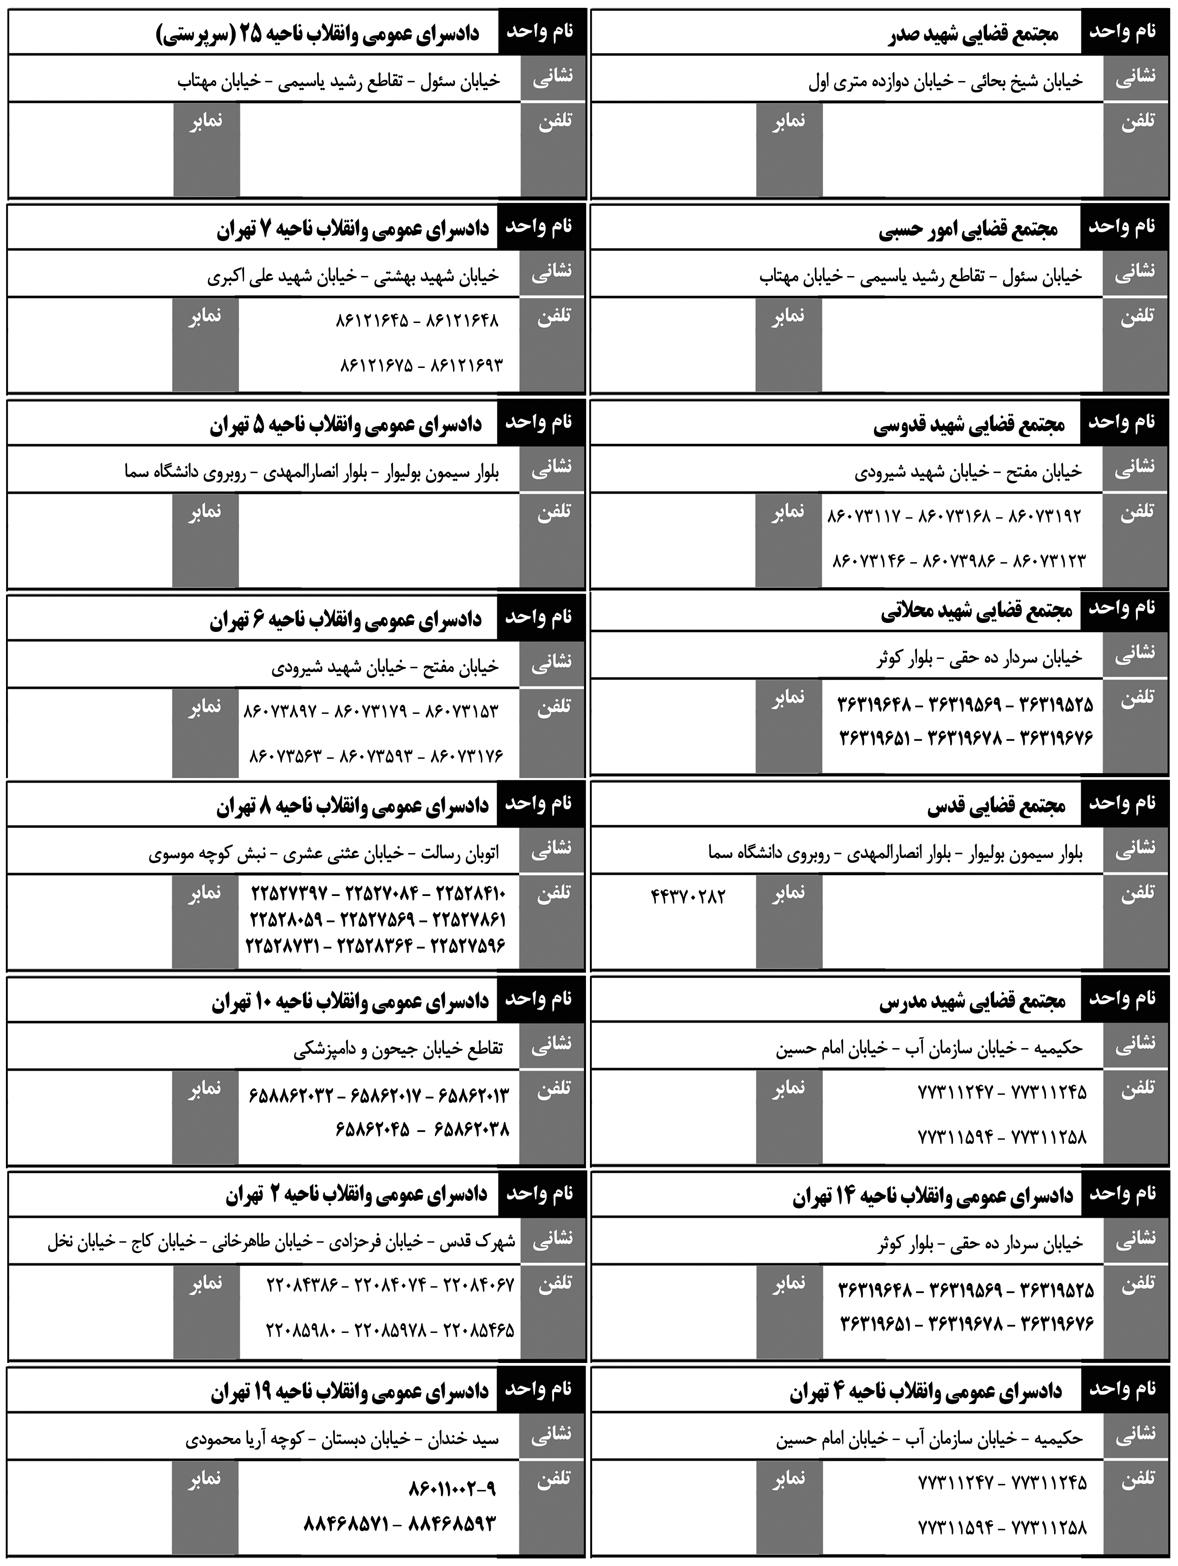 .jpg - تغییرات نشانی برخی مجتمع های قضایی تهران